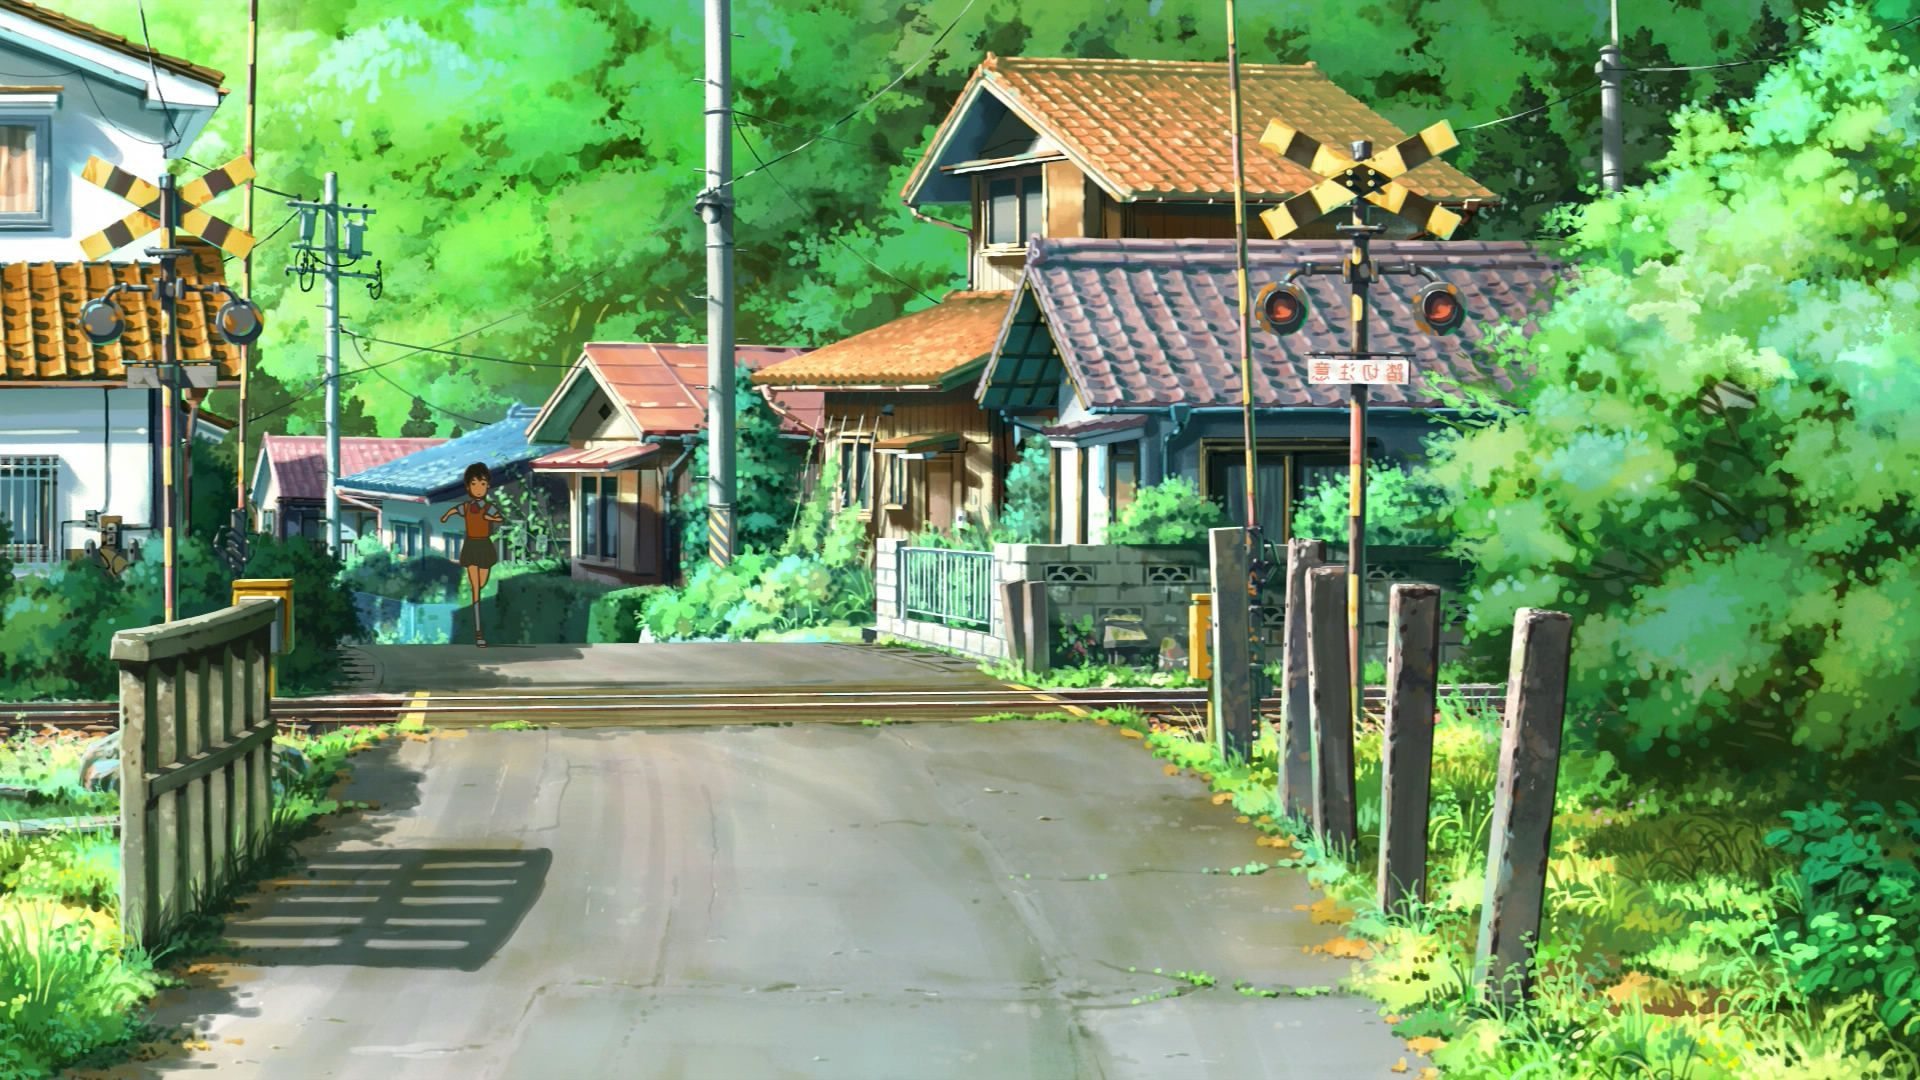 Anime Scenery Wallpaper 42589 1920x1080 Px Hdwallsource Com Scenery Wallpaper Landscape Wallpaper Anime Scenery Wallpaper